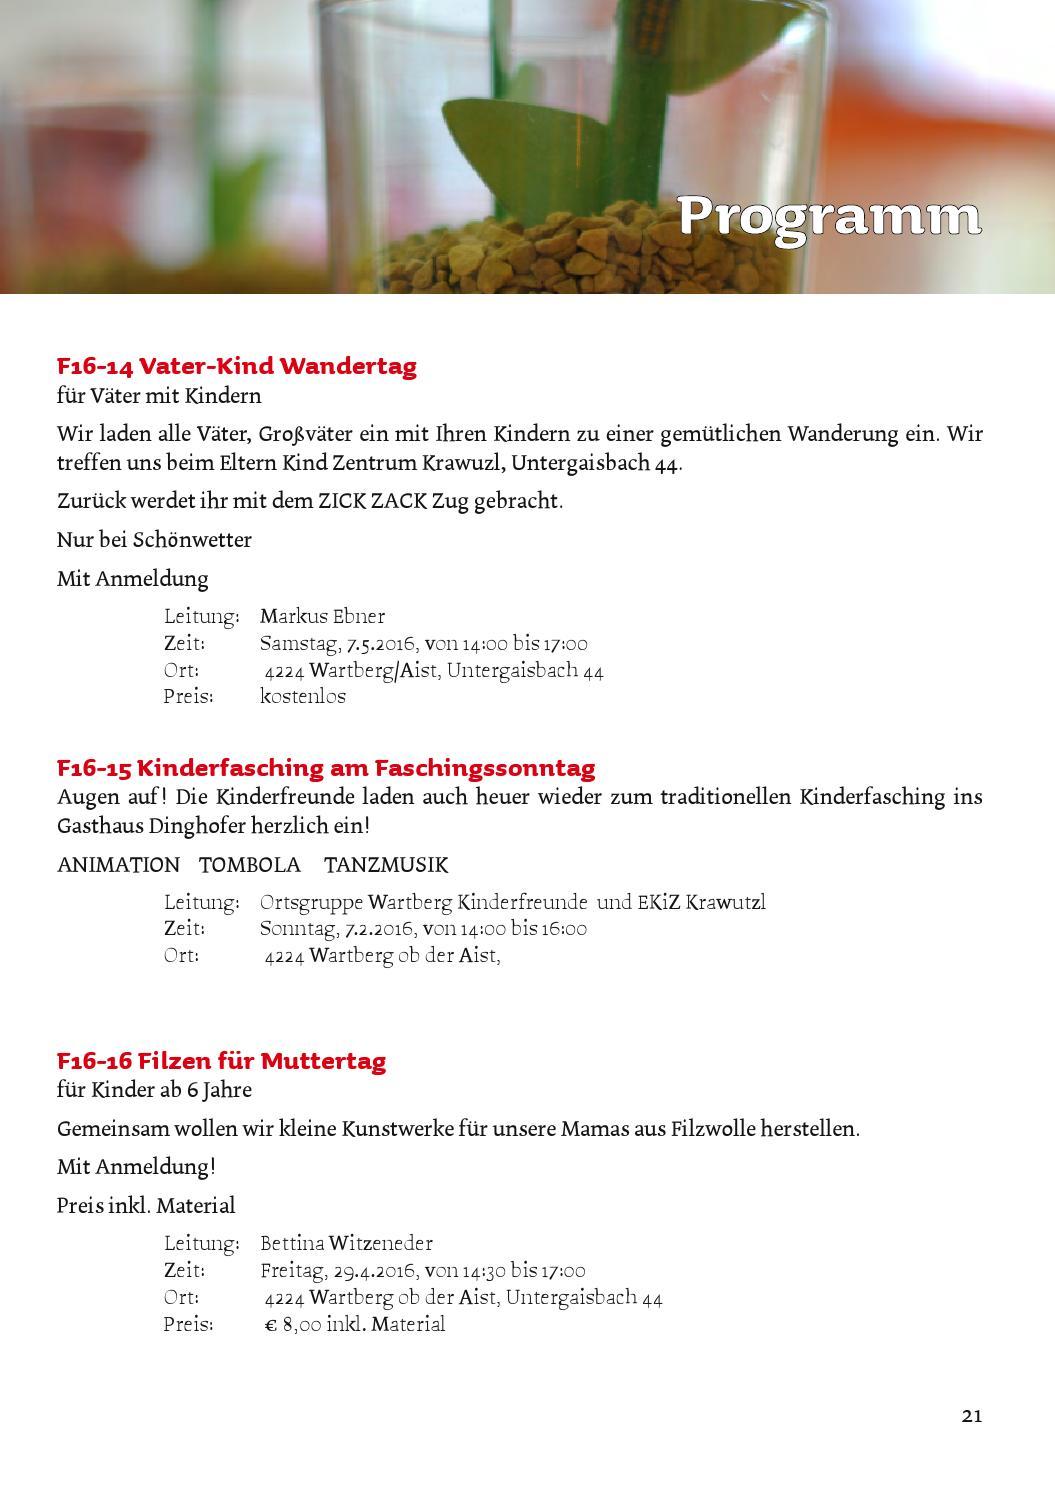 Archiv - VS Wartberg/Aist - Schulweb